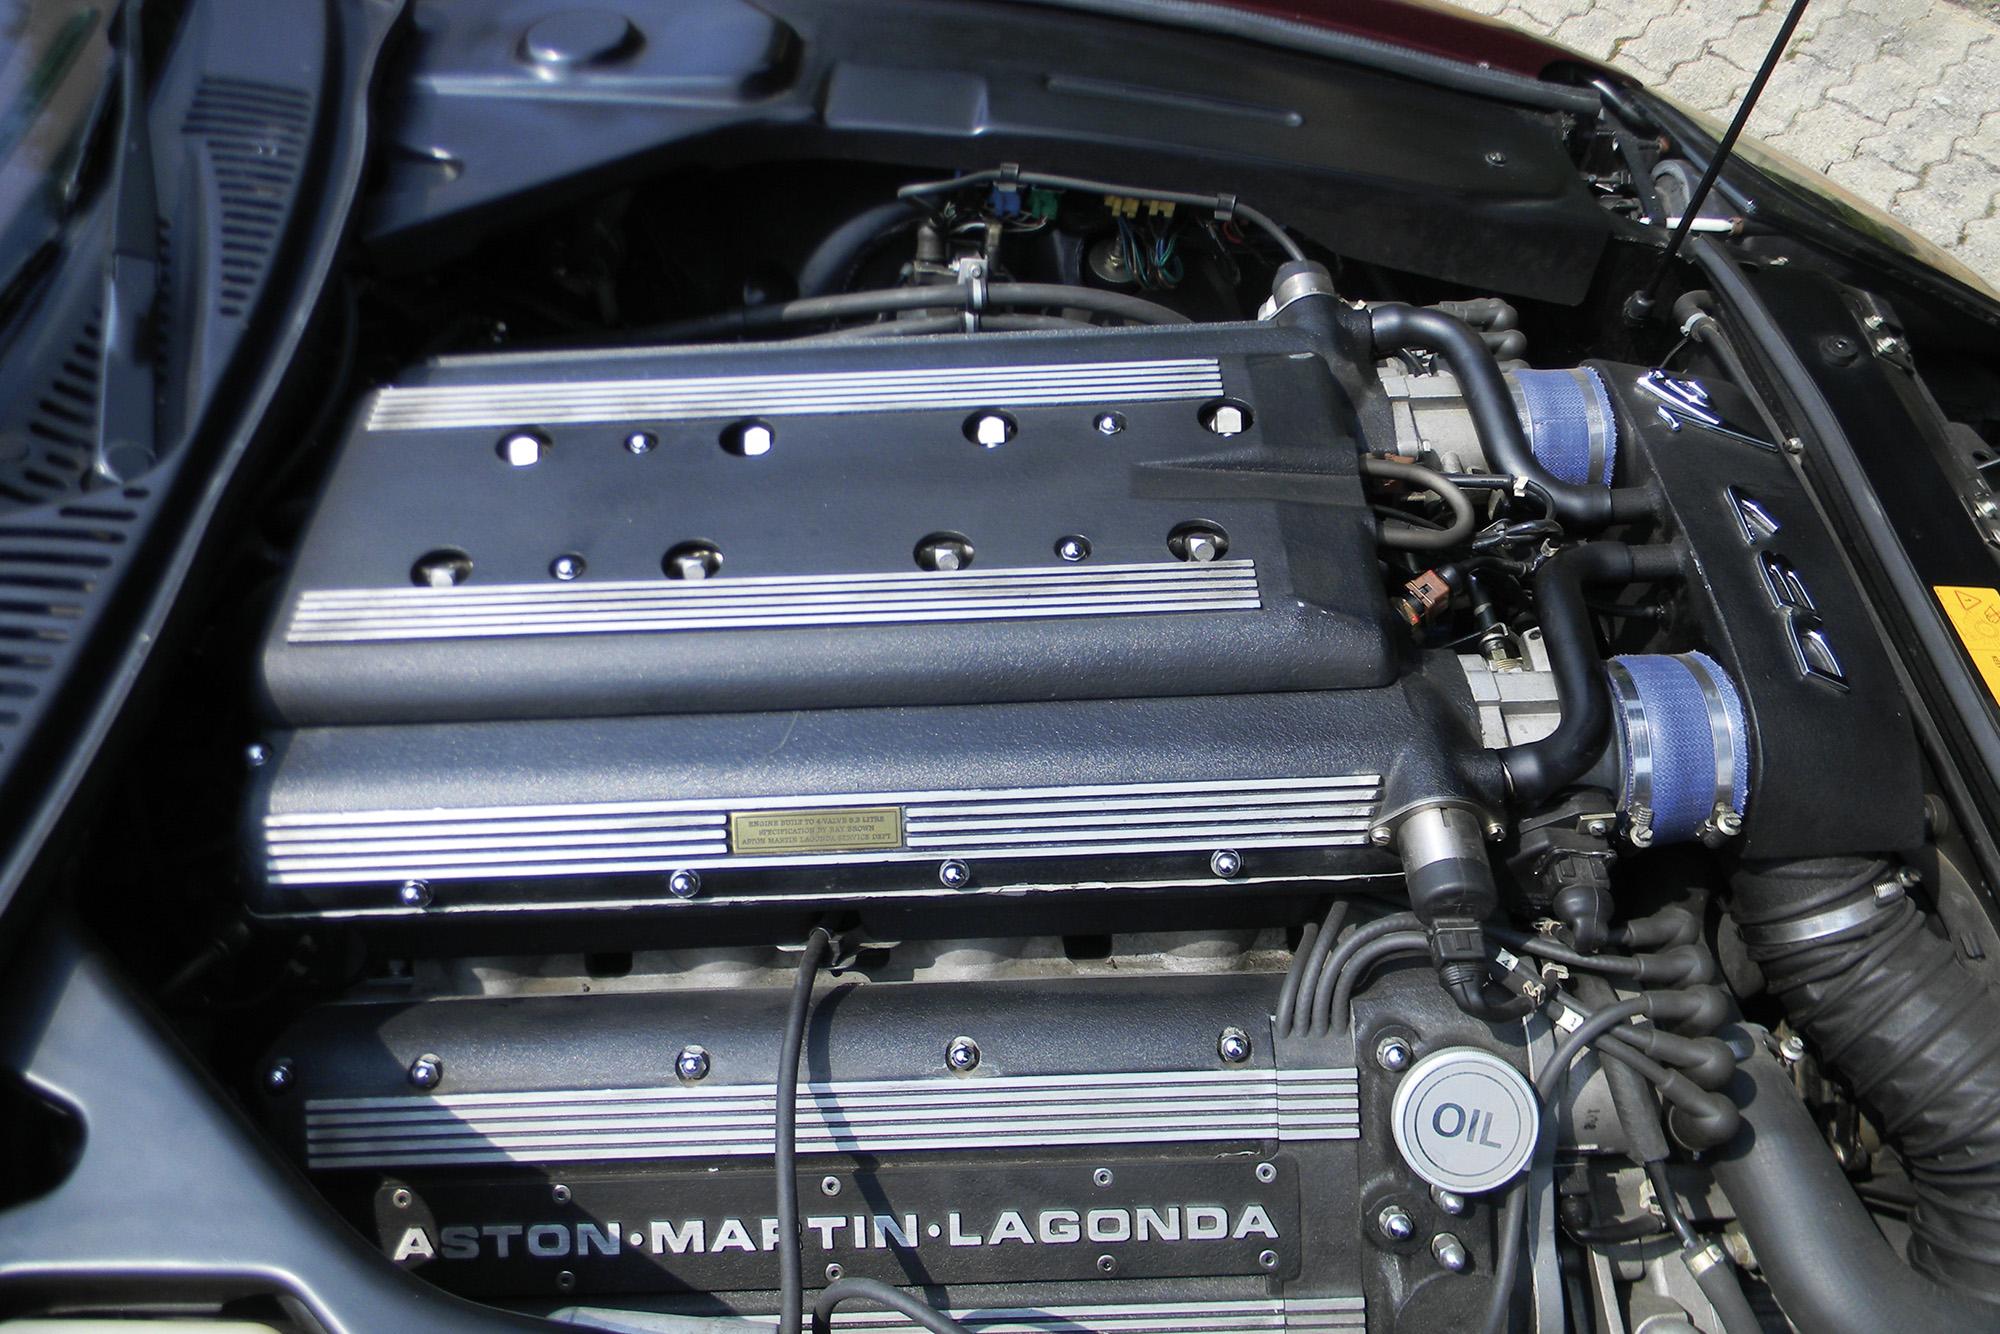 Aston Martin DB7 engine